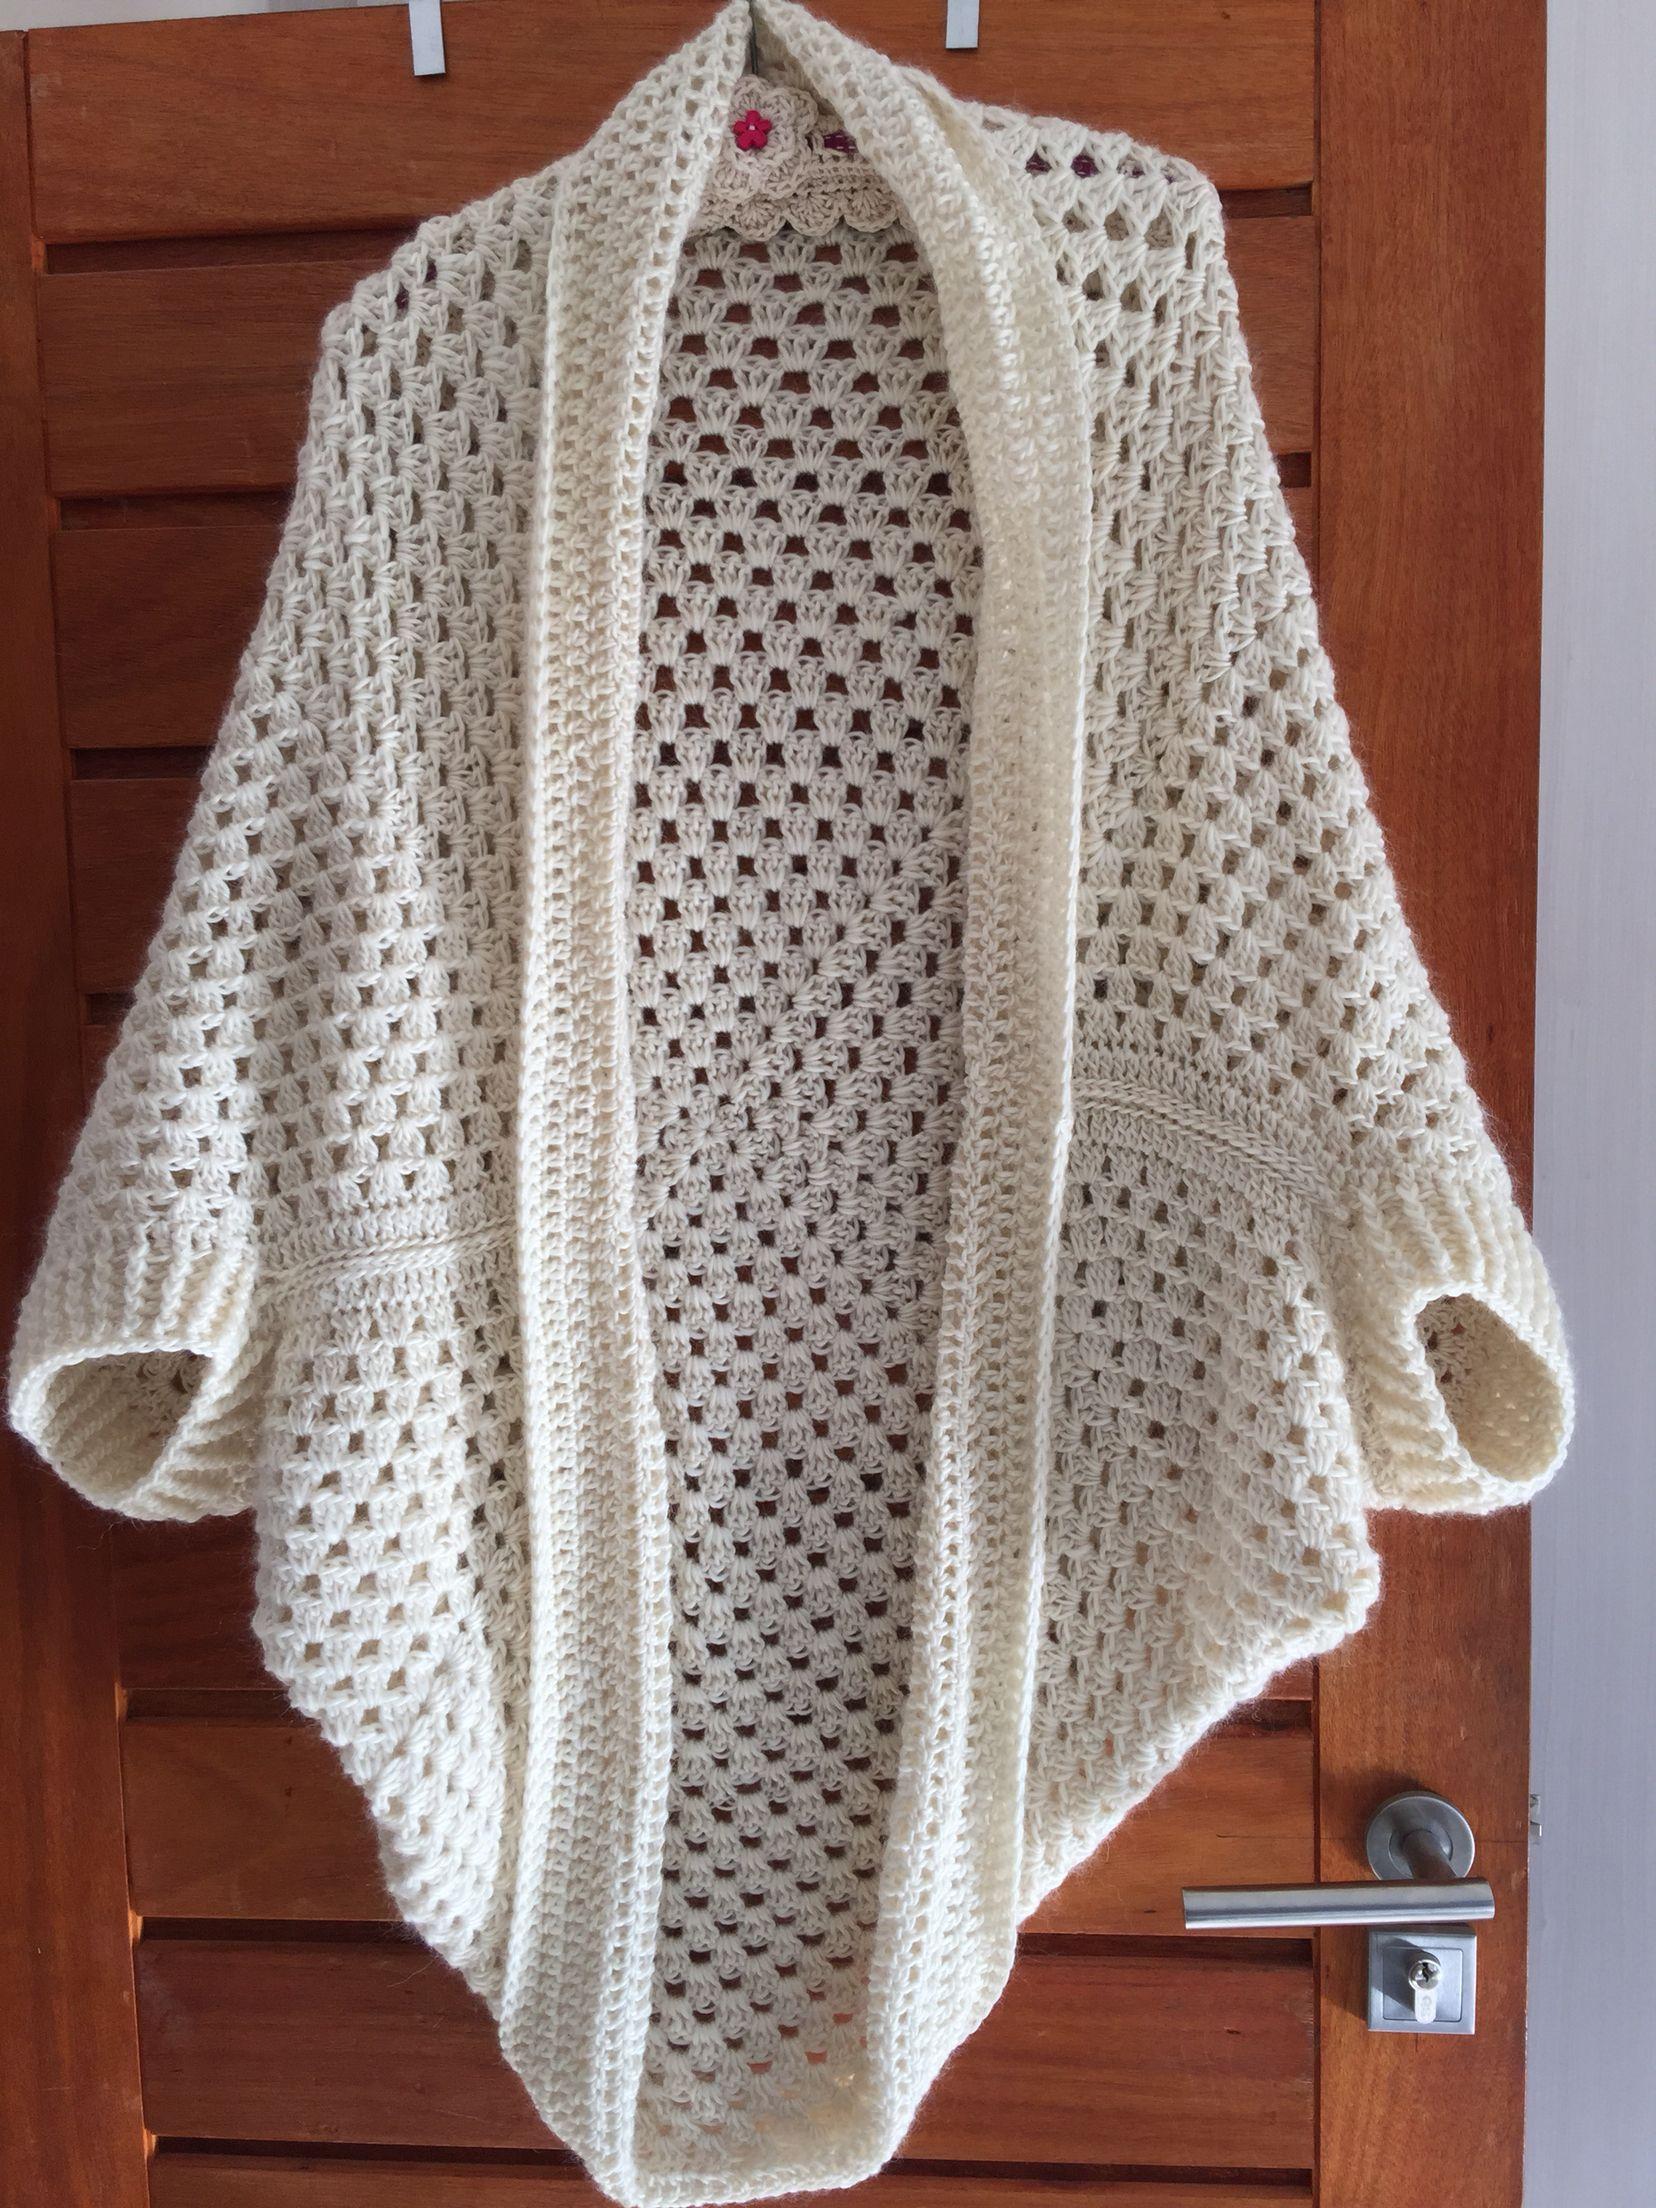 Easy Shrug Knitting Pattern Free : Granny cocoon shrug crochet http mariavalles